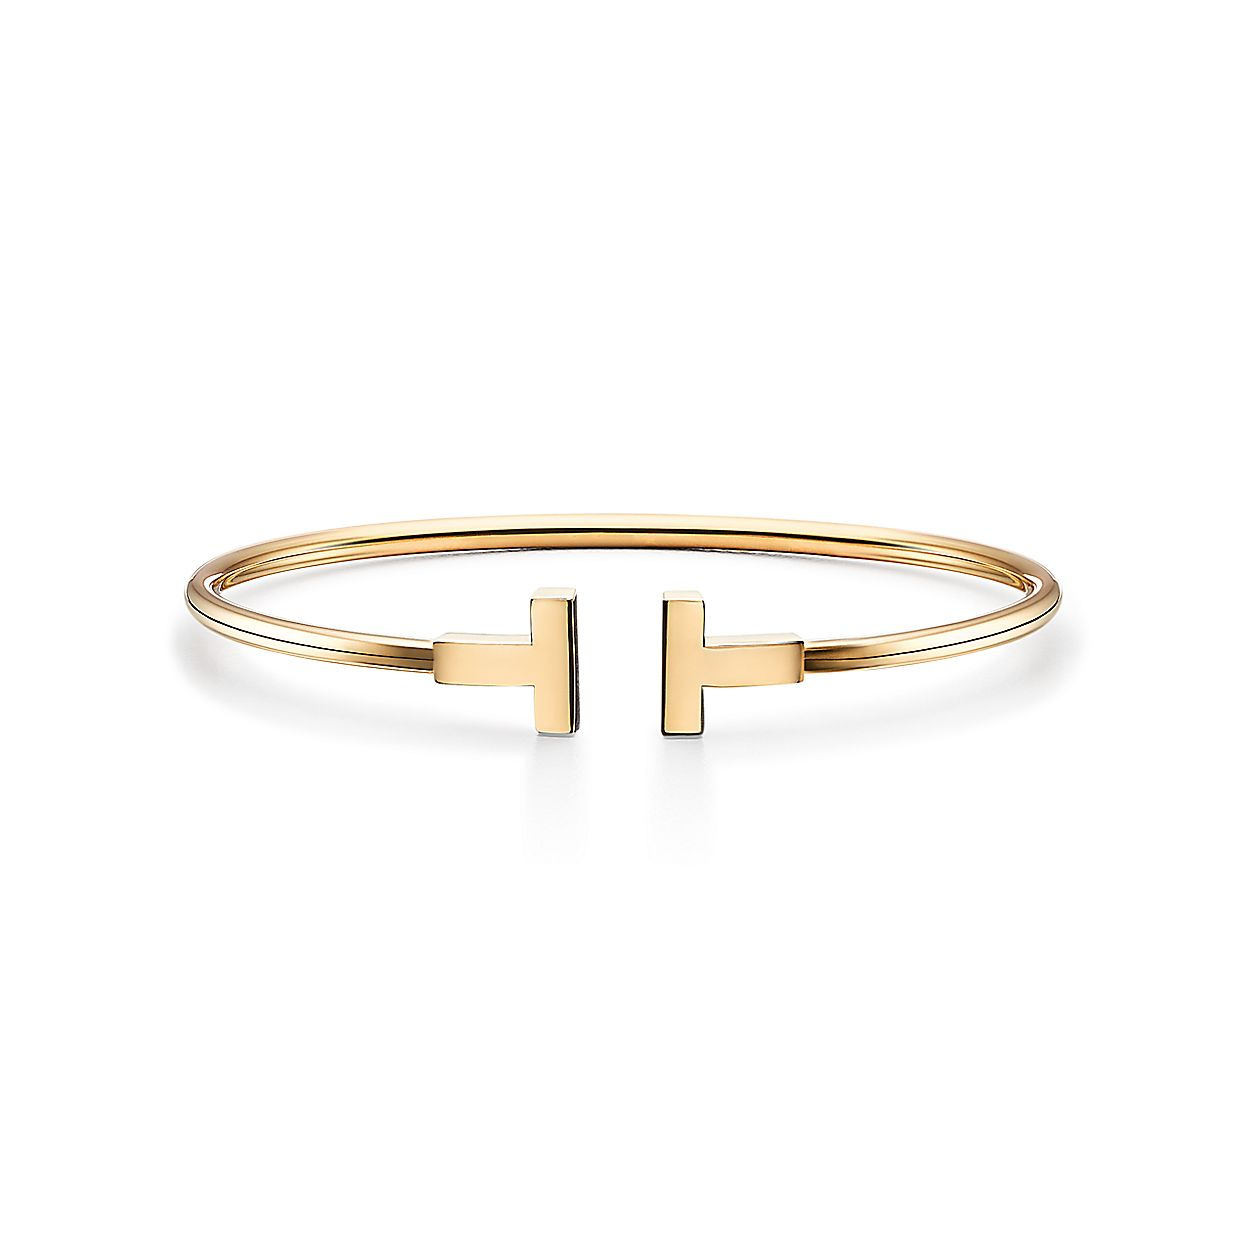 f1c64f28f Tiffany T wire bracelet in 18k gold, medium. | Tiffany & Co.